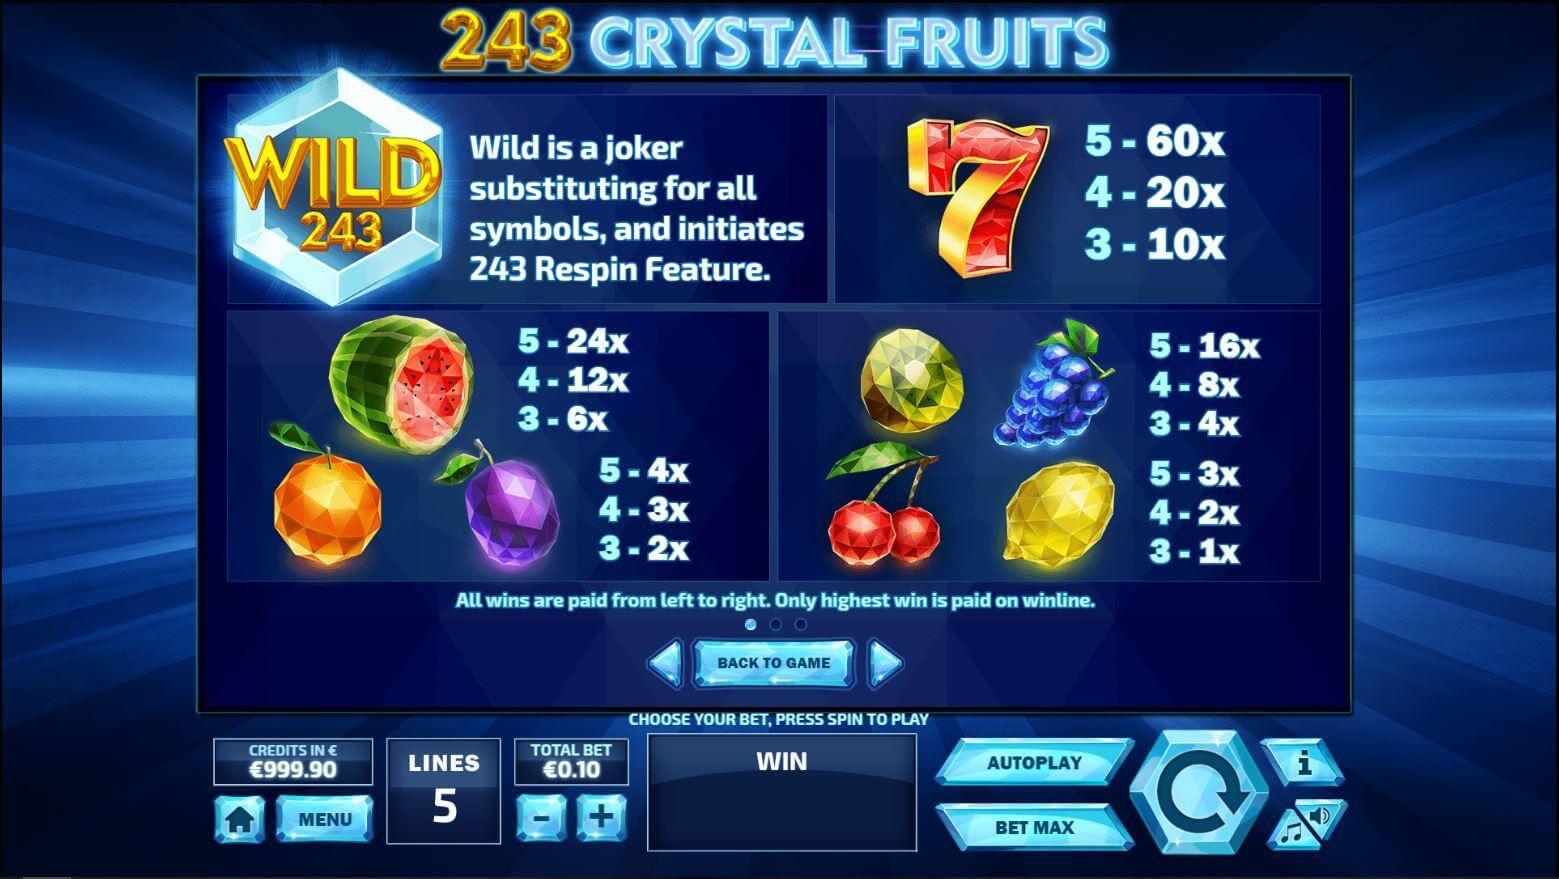 243 Crystal Fruits Bonus